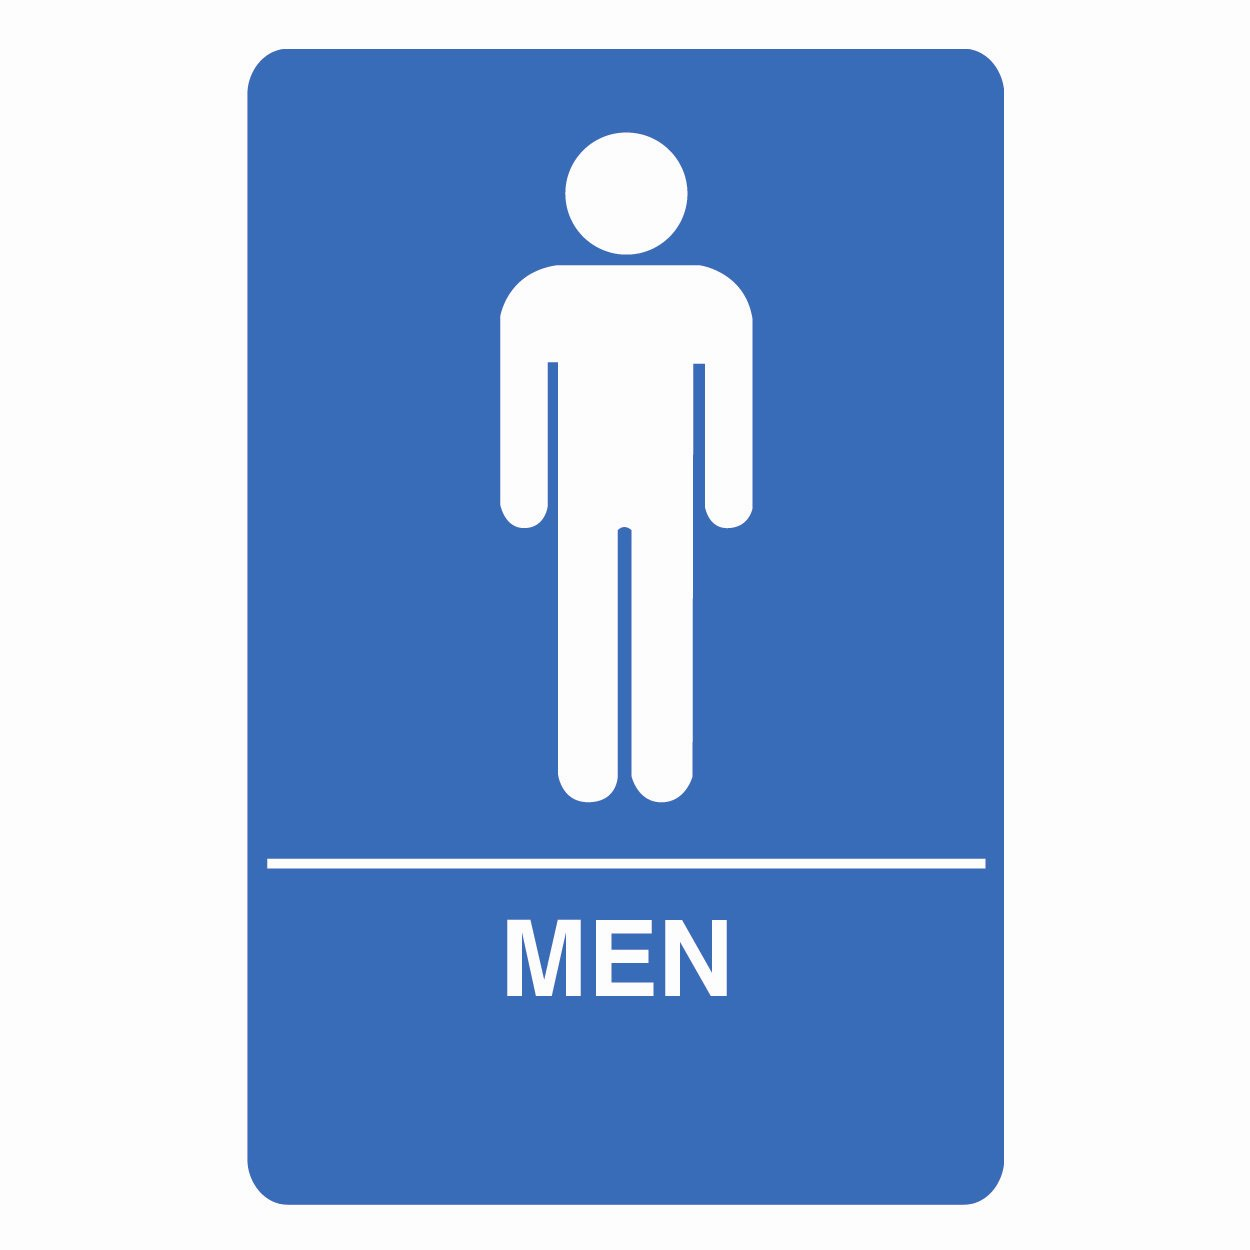 Free Men Bathroom Cliparts, Download Free Clip Art, Free.